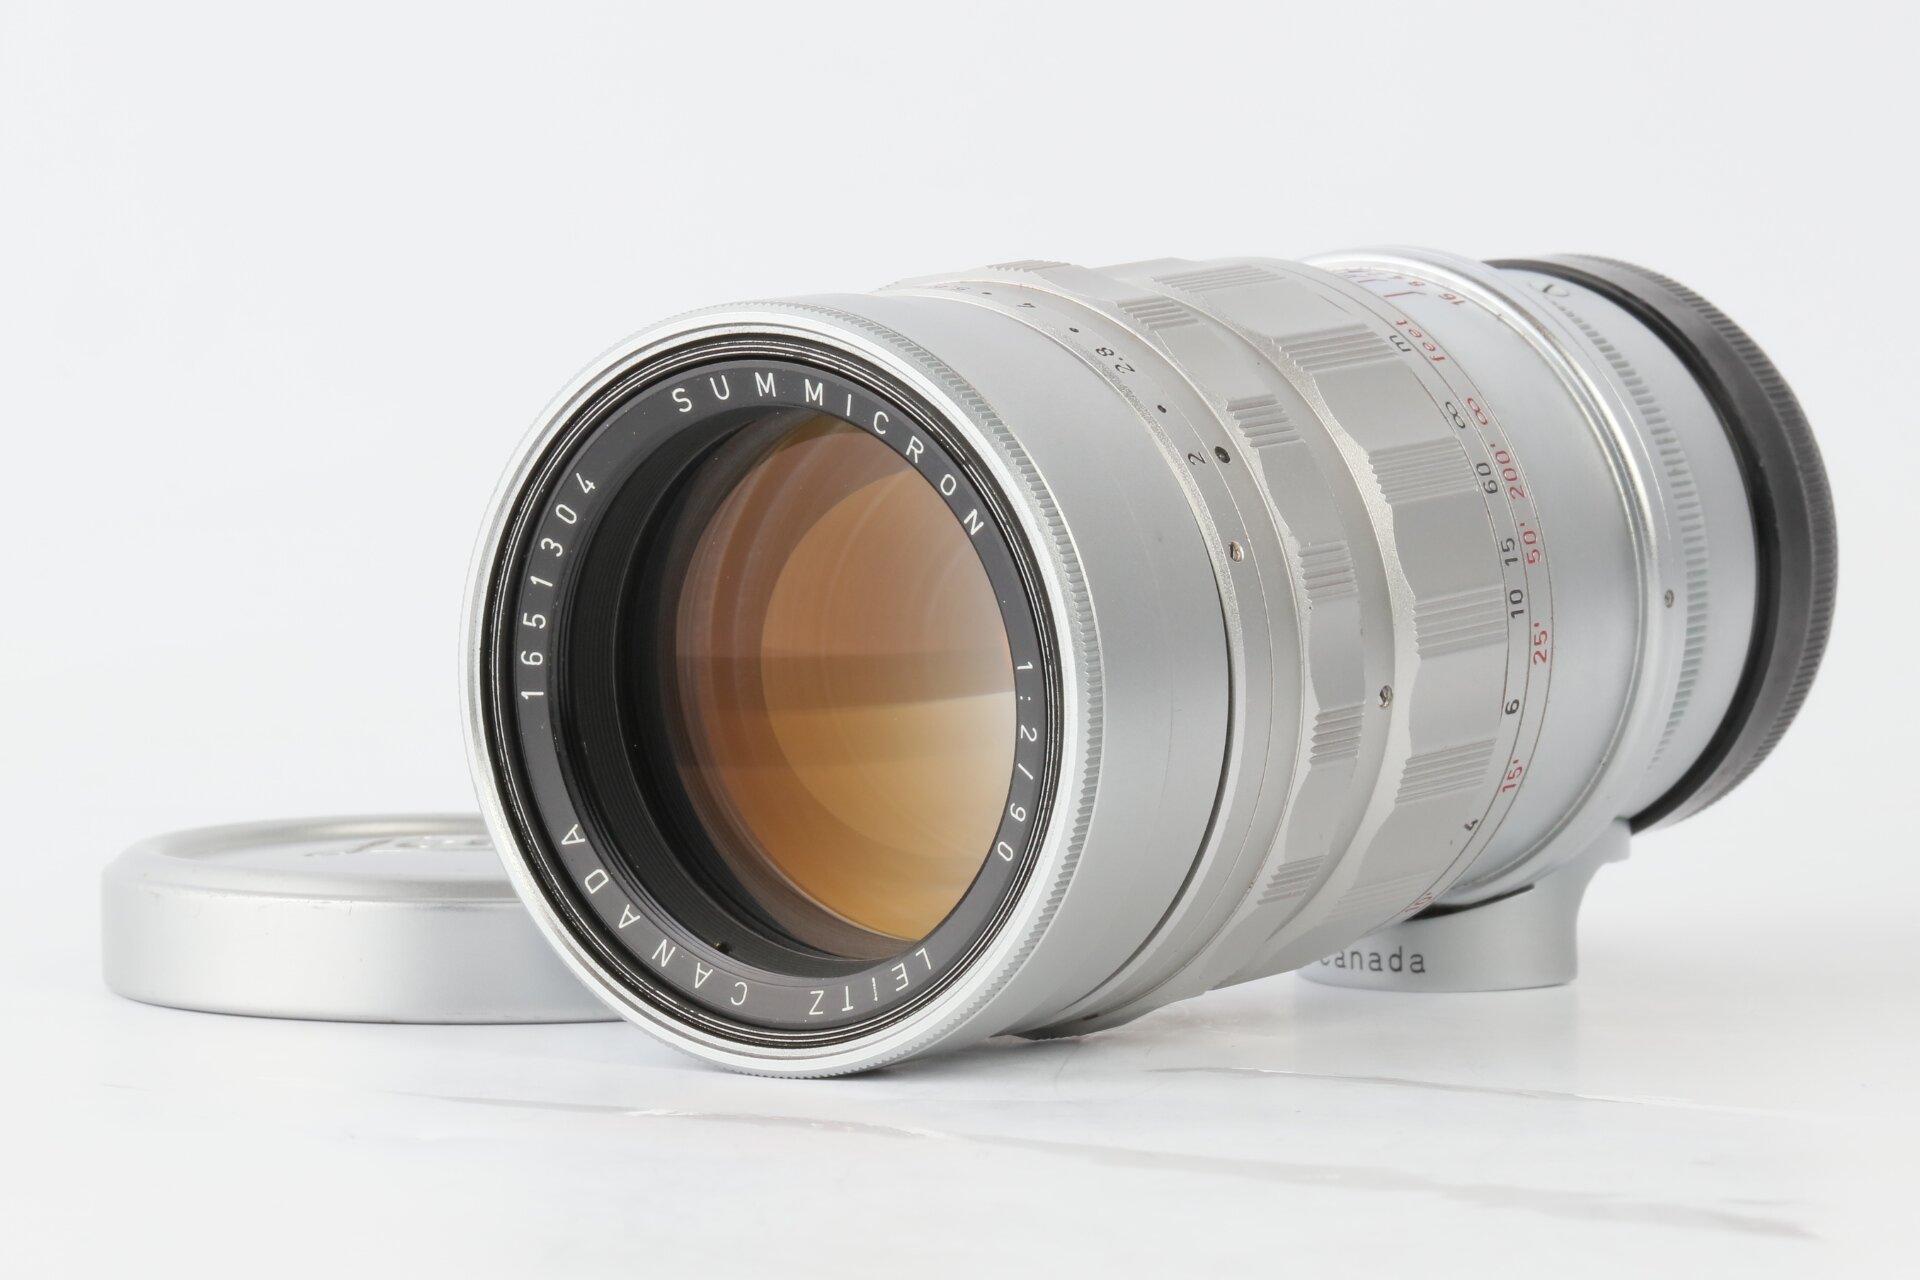 Leica M Summicron 2/90mm SEOOF